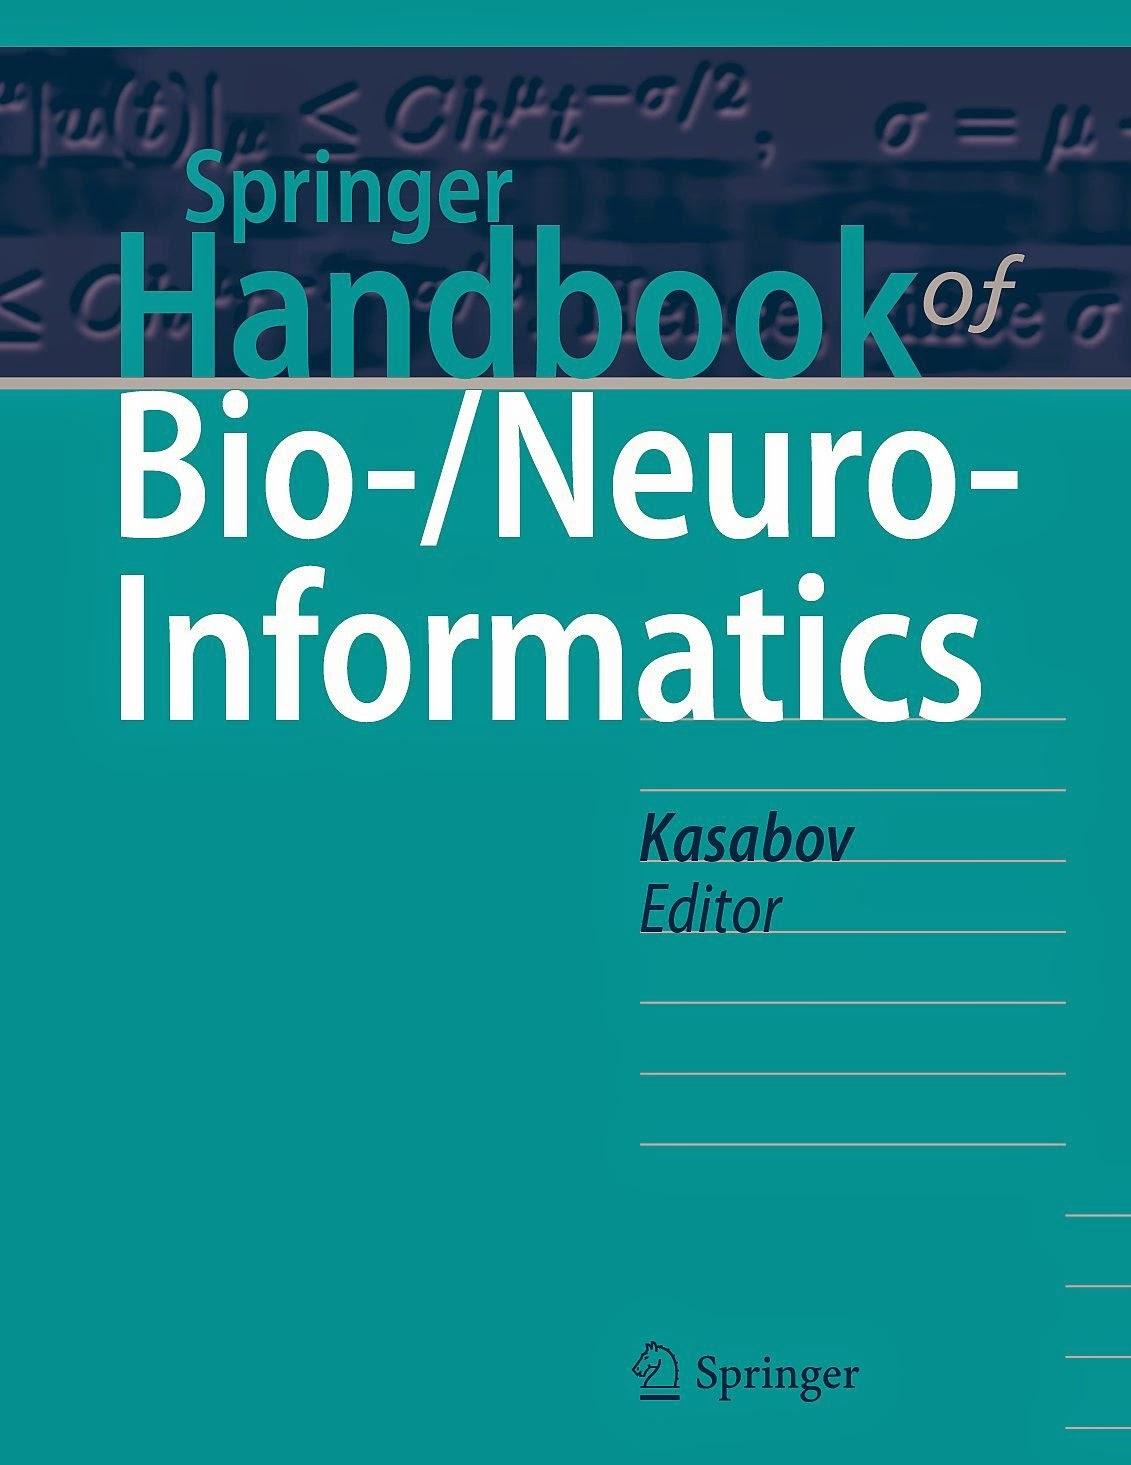 http://www.kingcheapebooks.com/2015/03/springer-handbook-of-bio-neuro.html